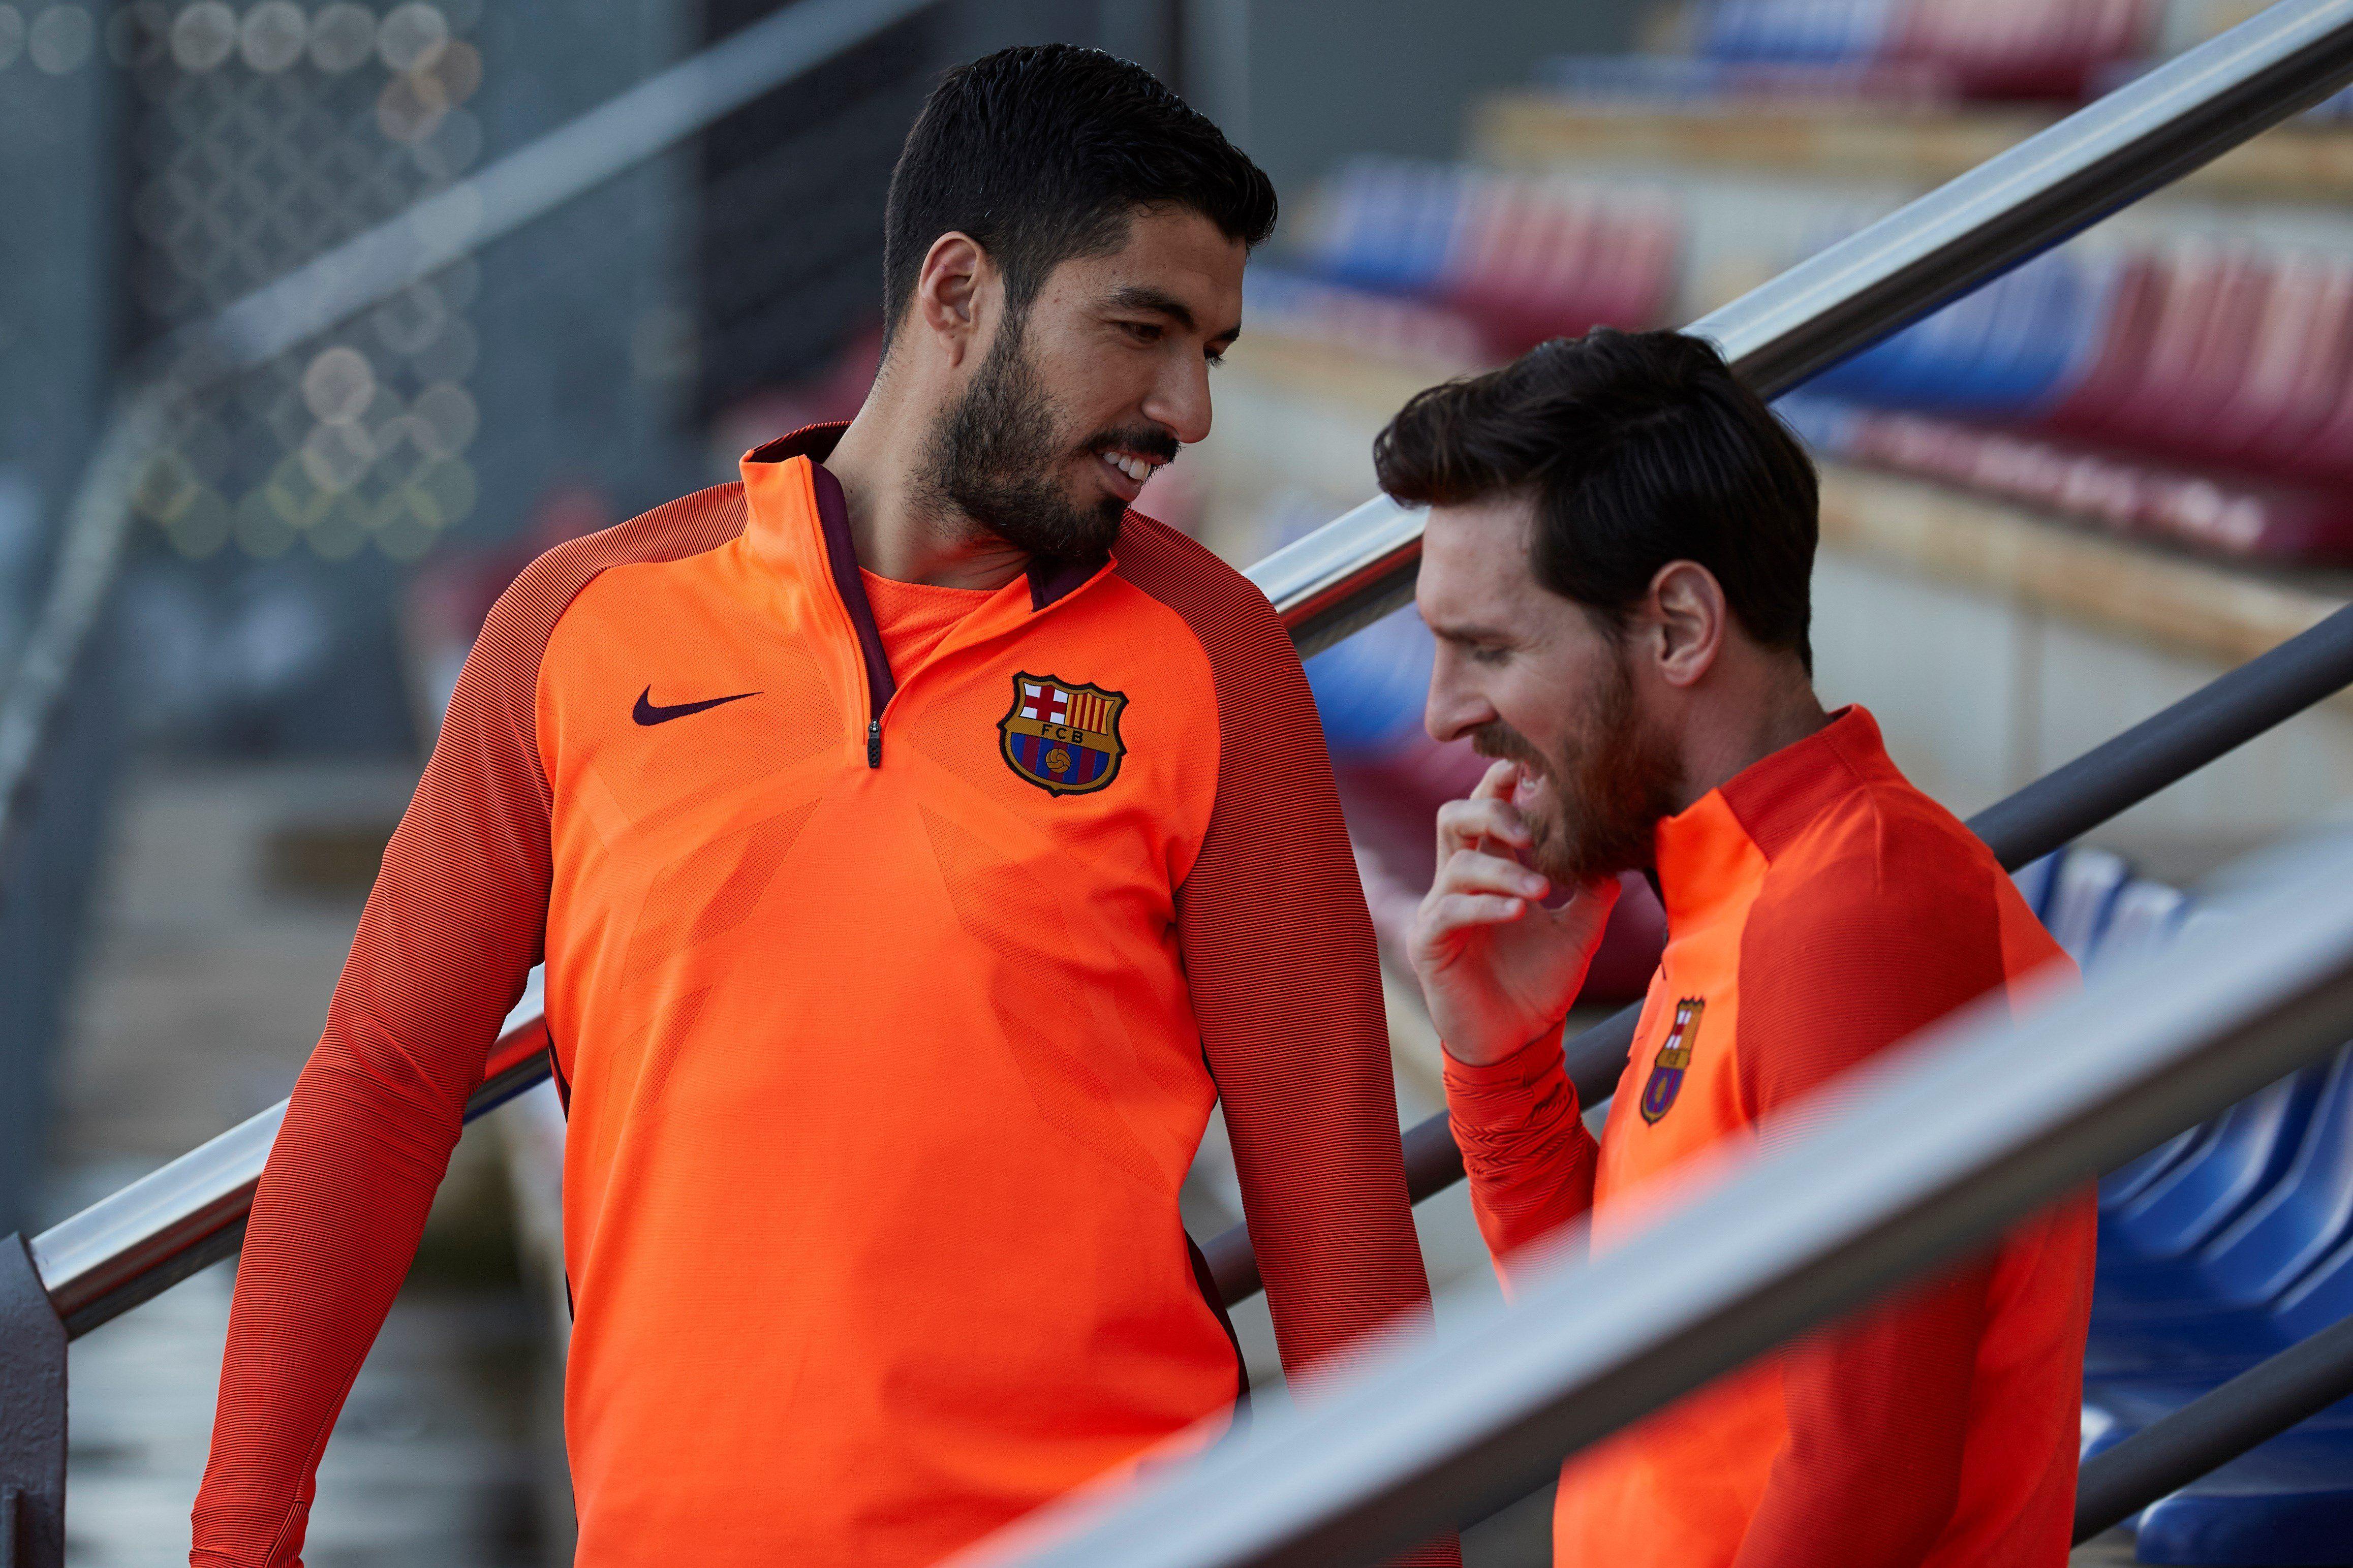 El Barcelona estudia vender a Suárez por ser una influencia negativa sobre Messi